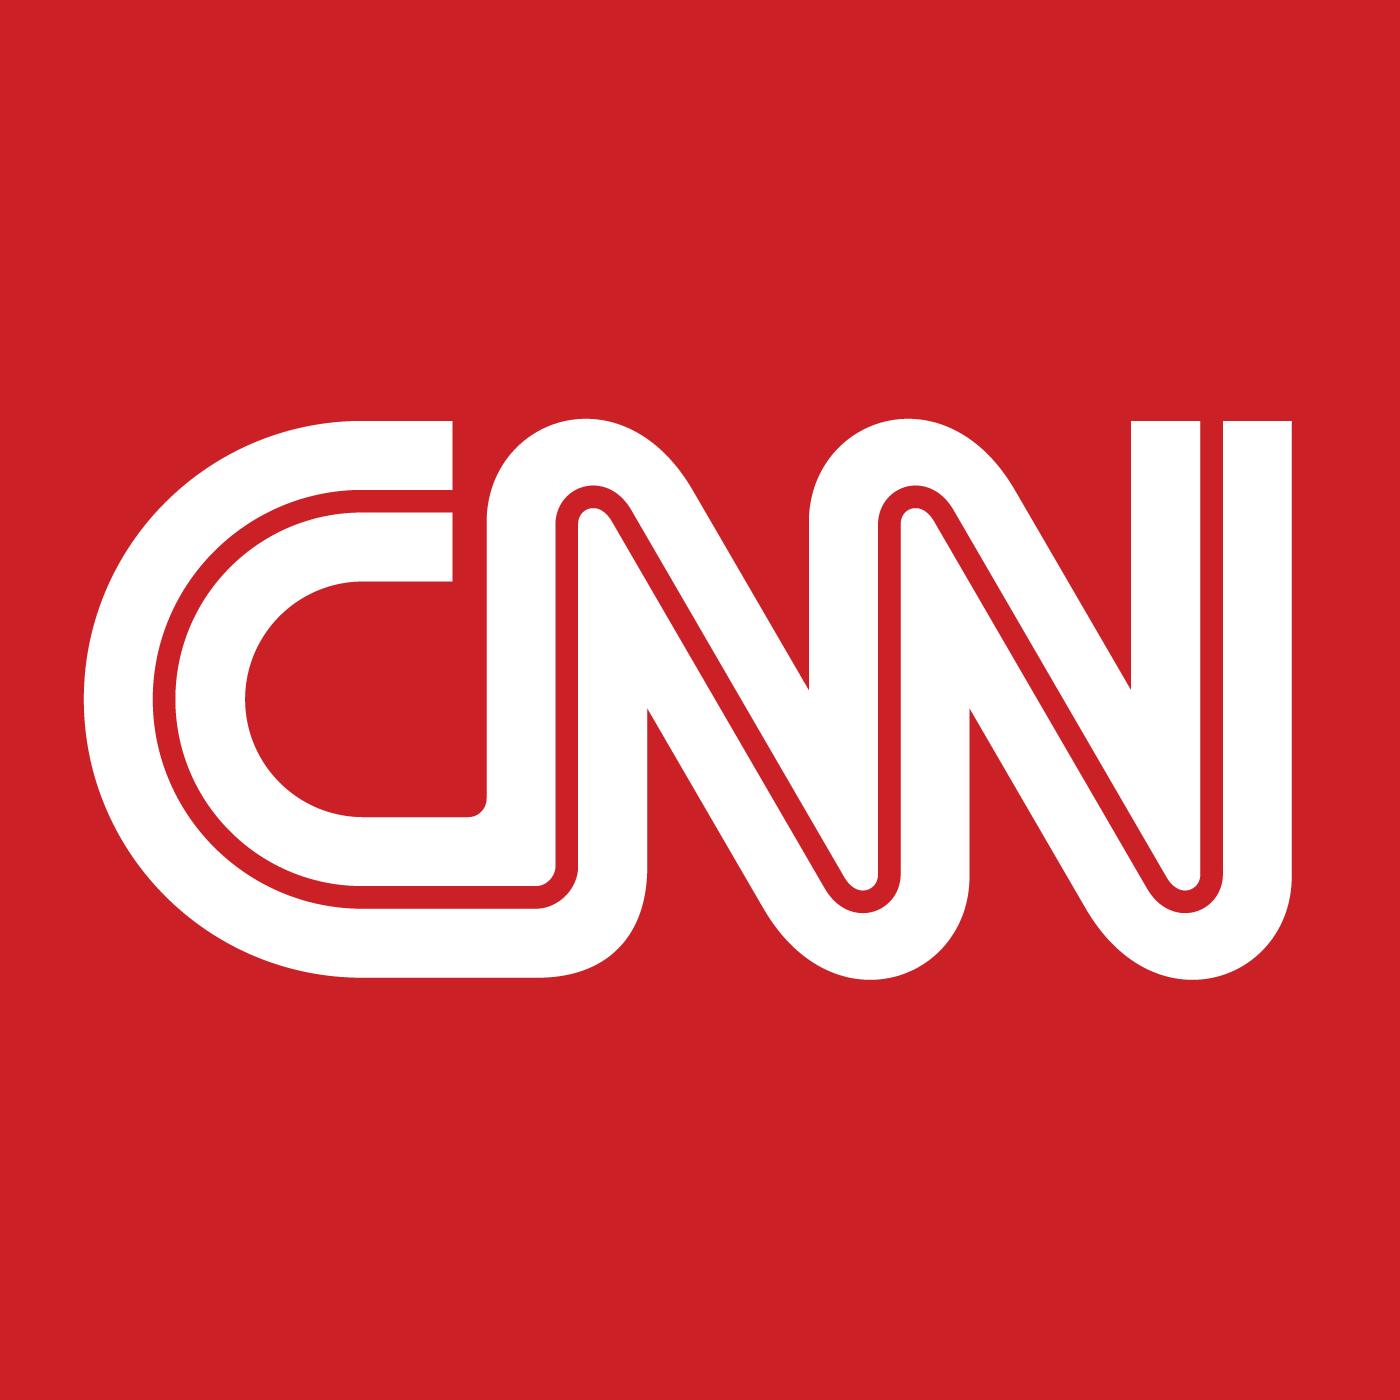 Image result for cnn logo